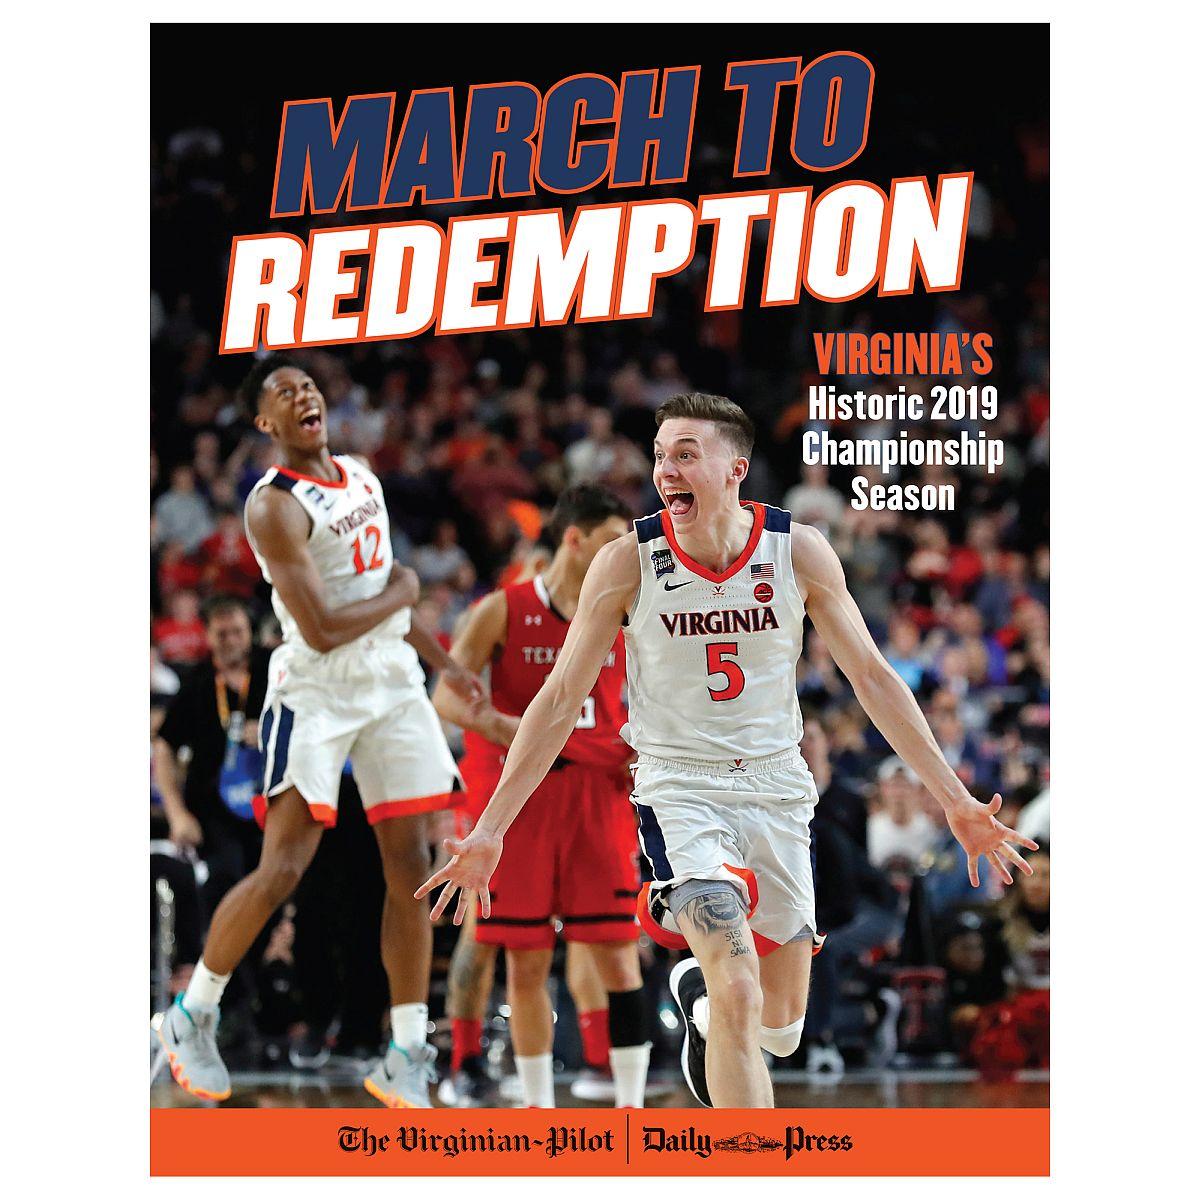 March to Redemption: Virginia's Historic 2019 Championship Season